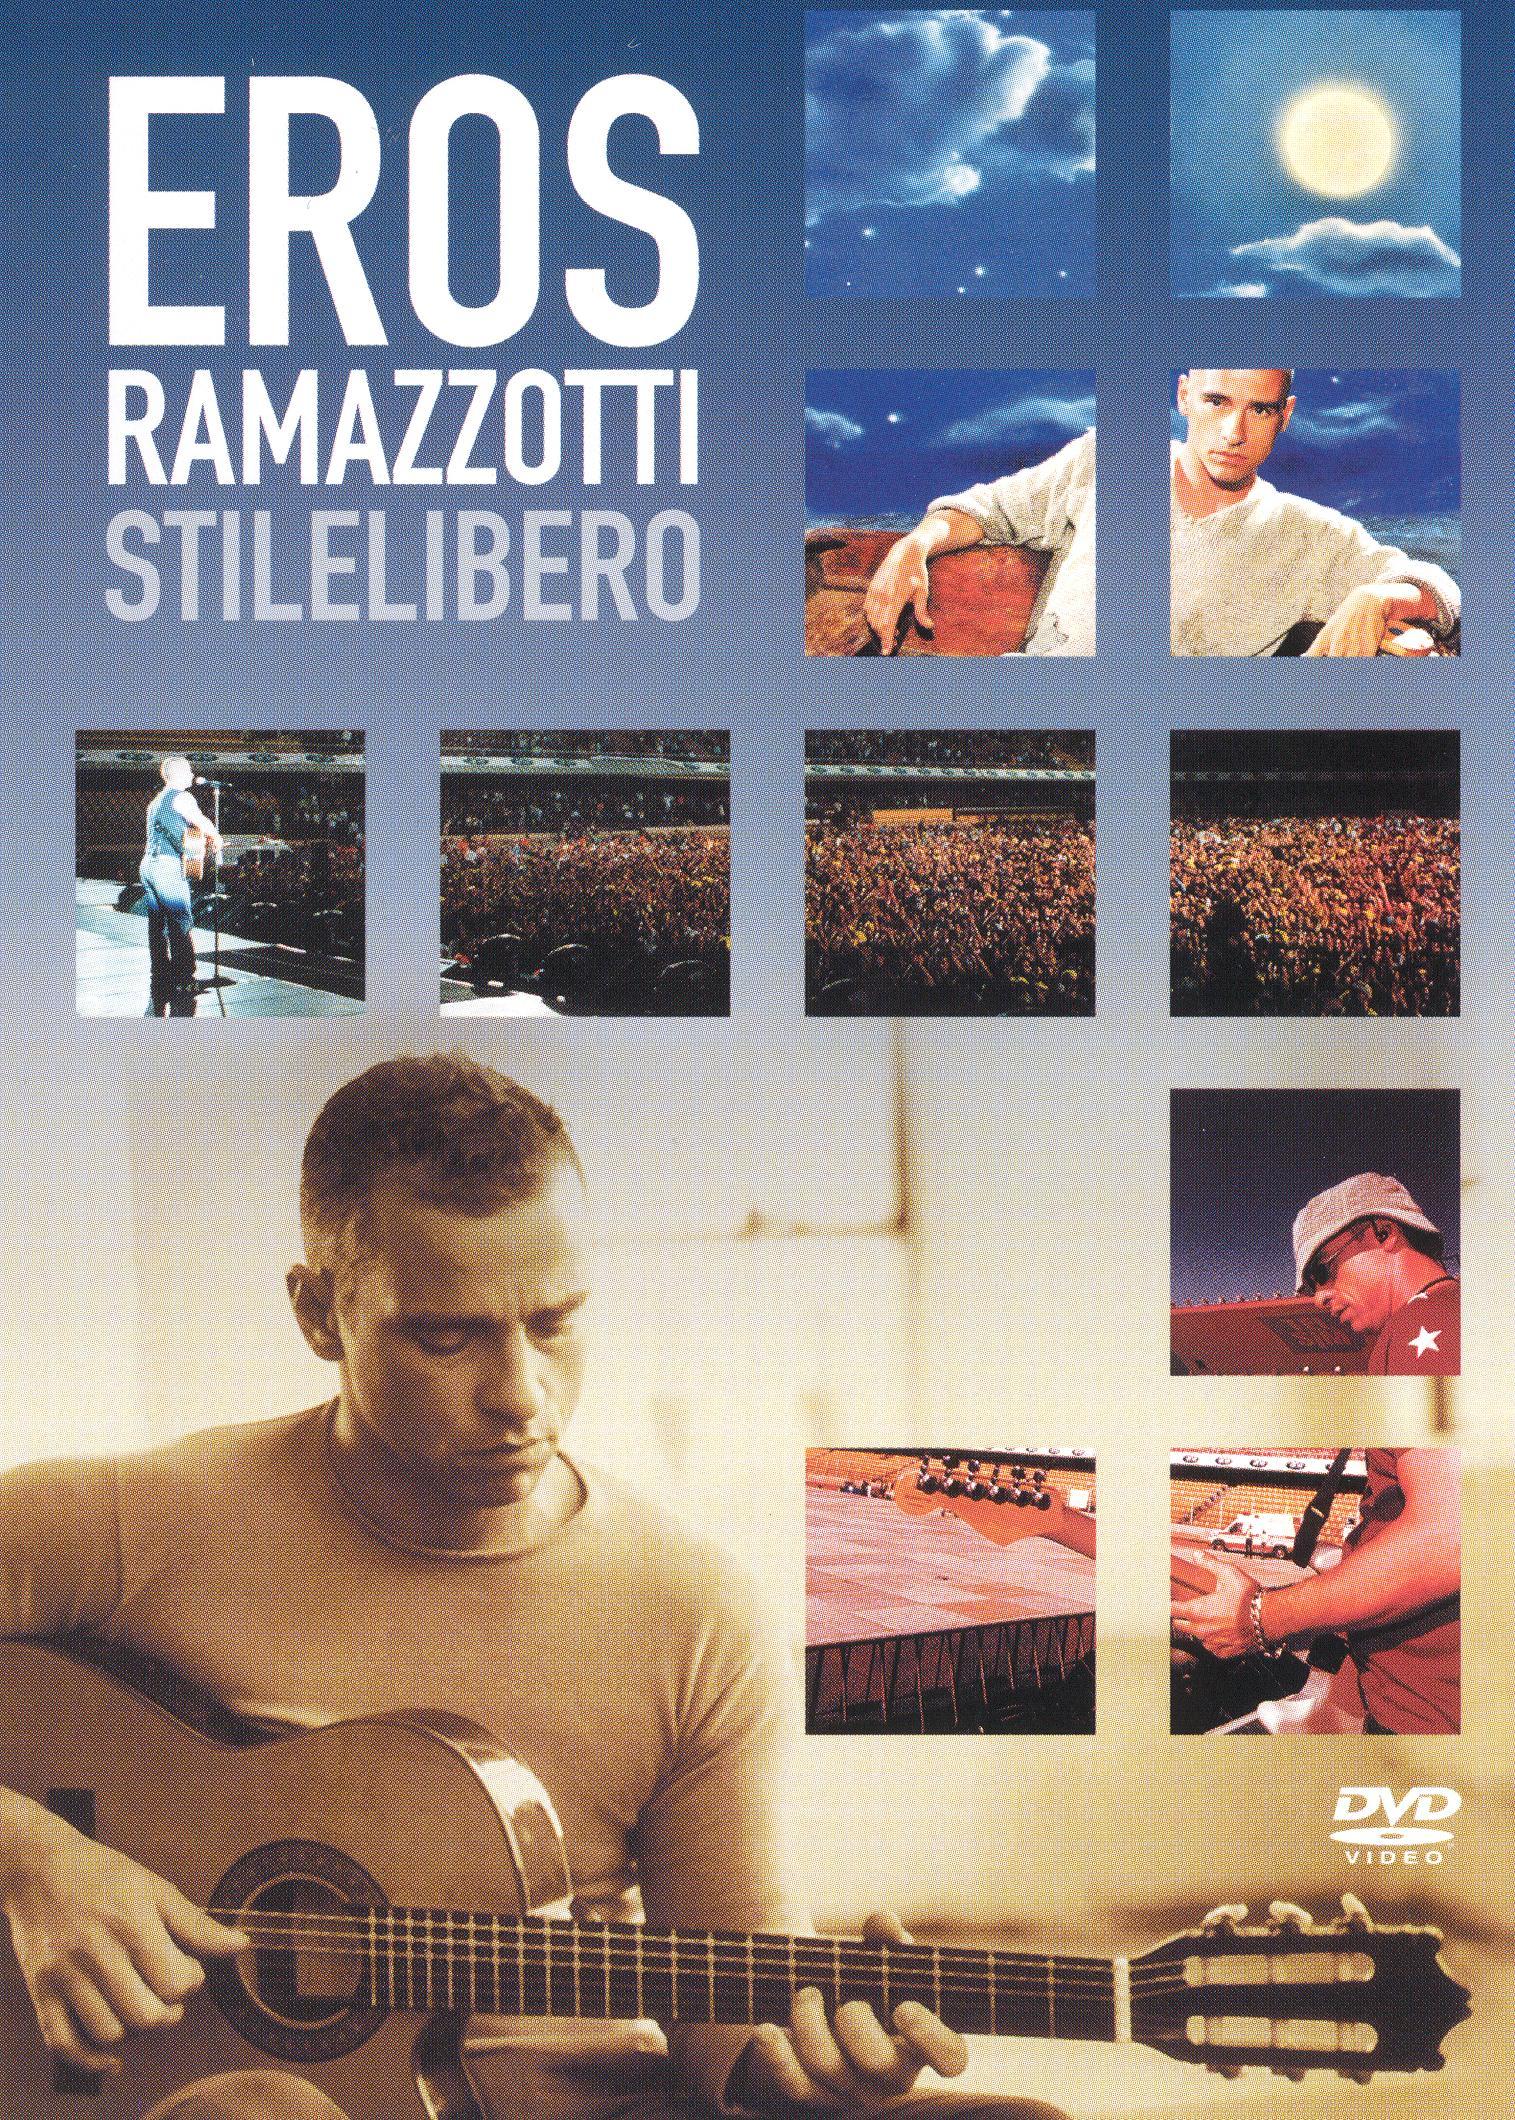 Eros Ramazzotti: Stilelibero